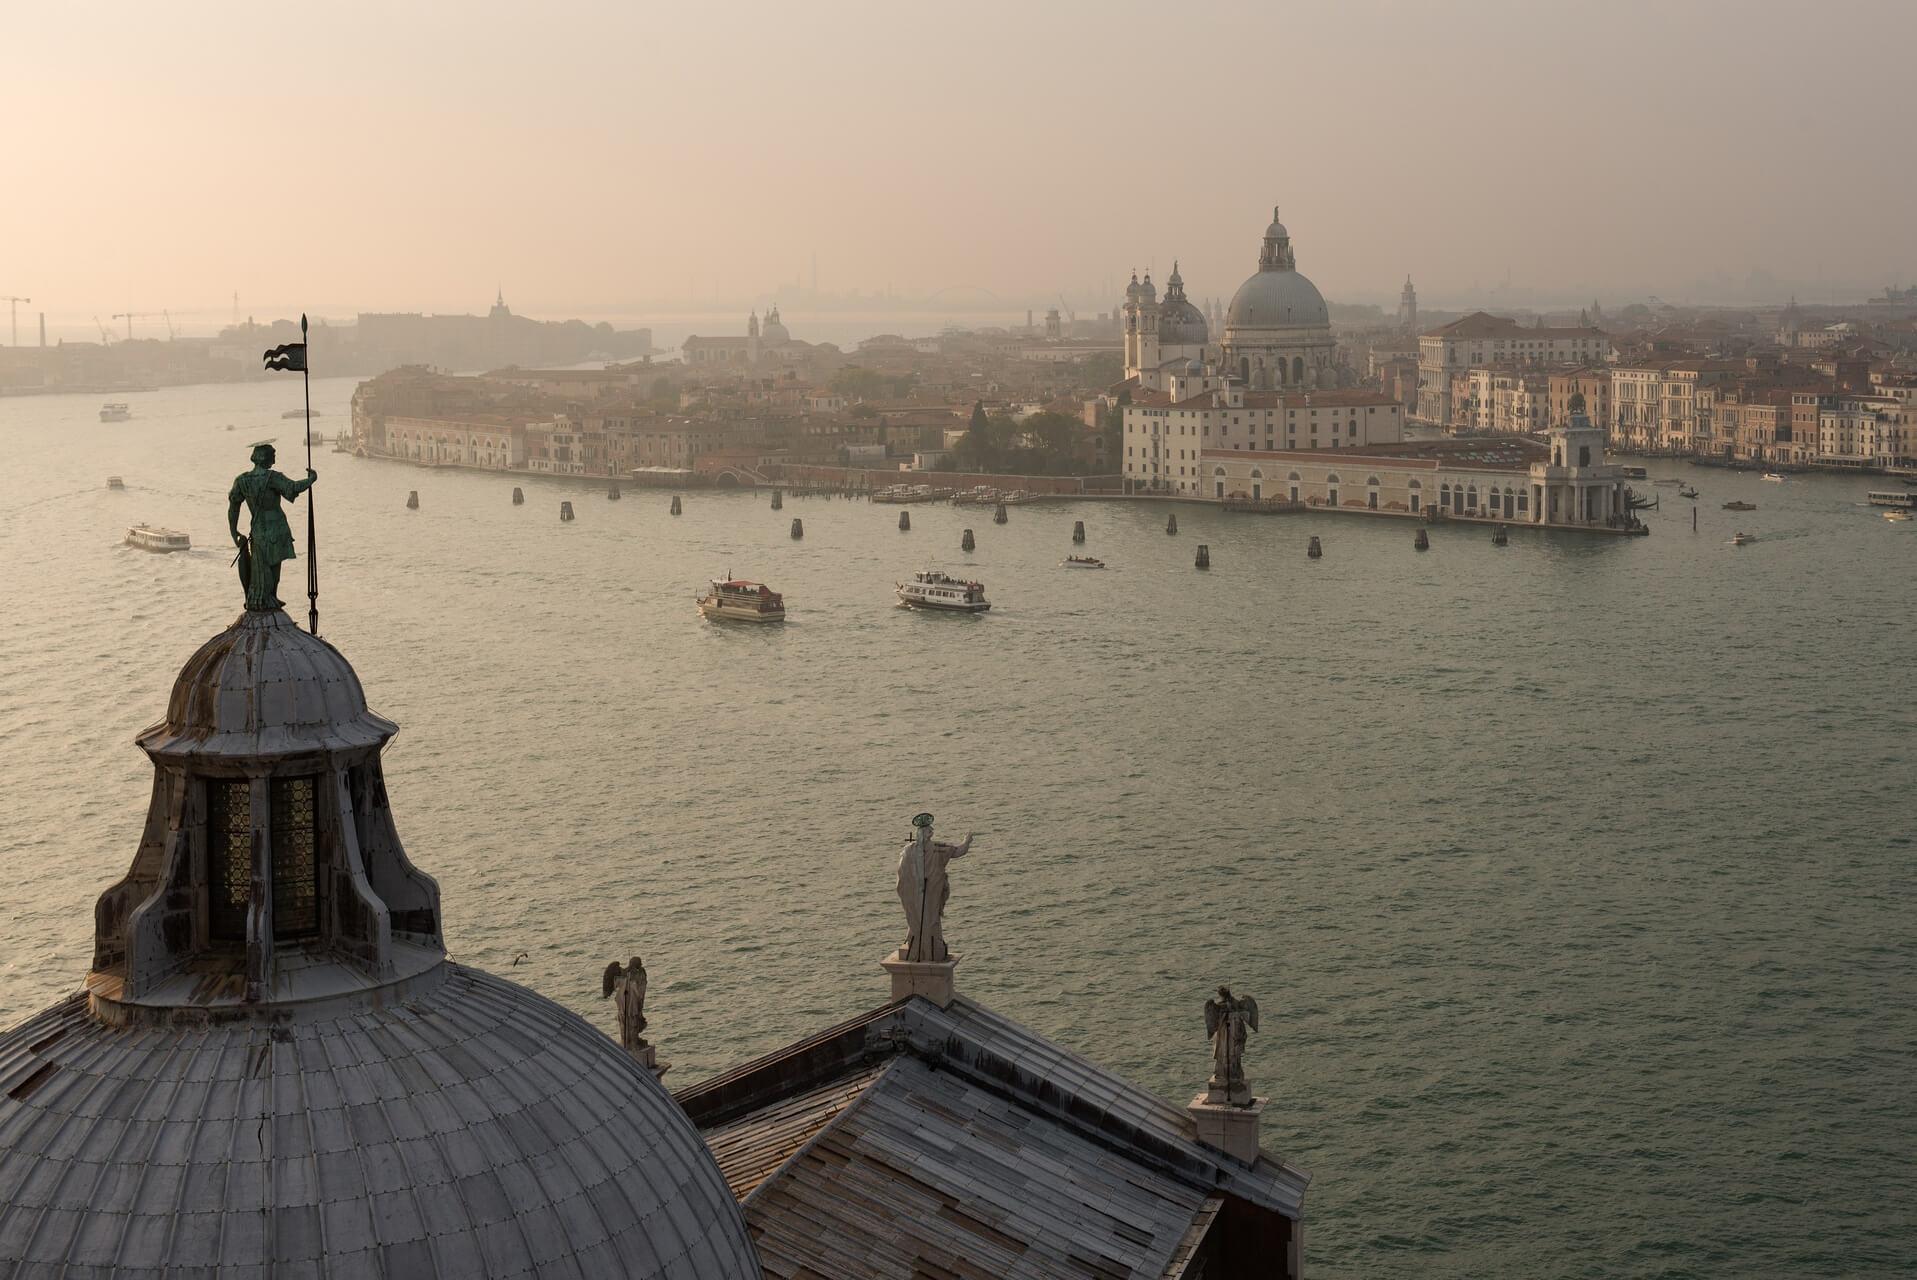 Italien: Venedig Italiy: Venice Santa Maria della Salute, Fotograf: Steffen Lohse